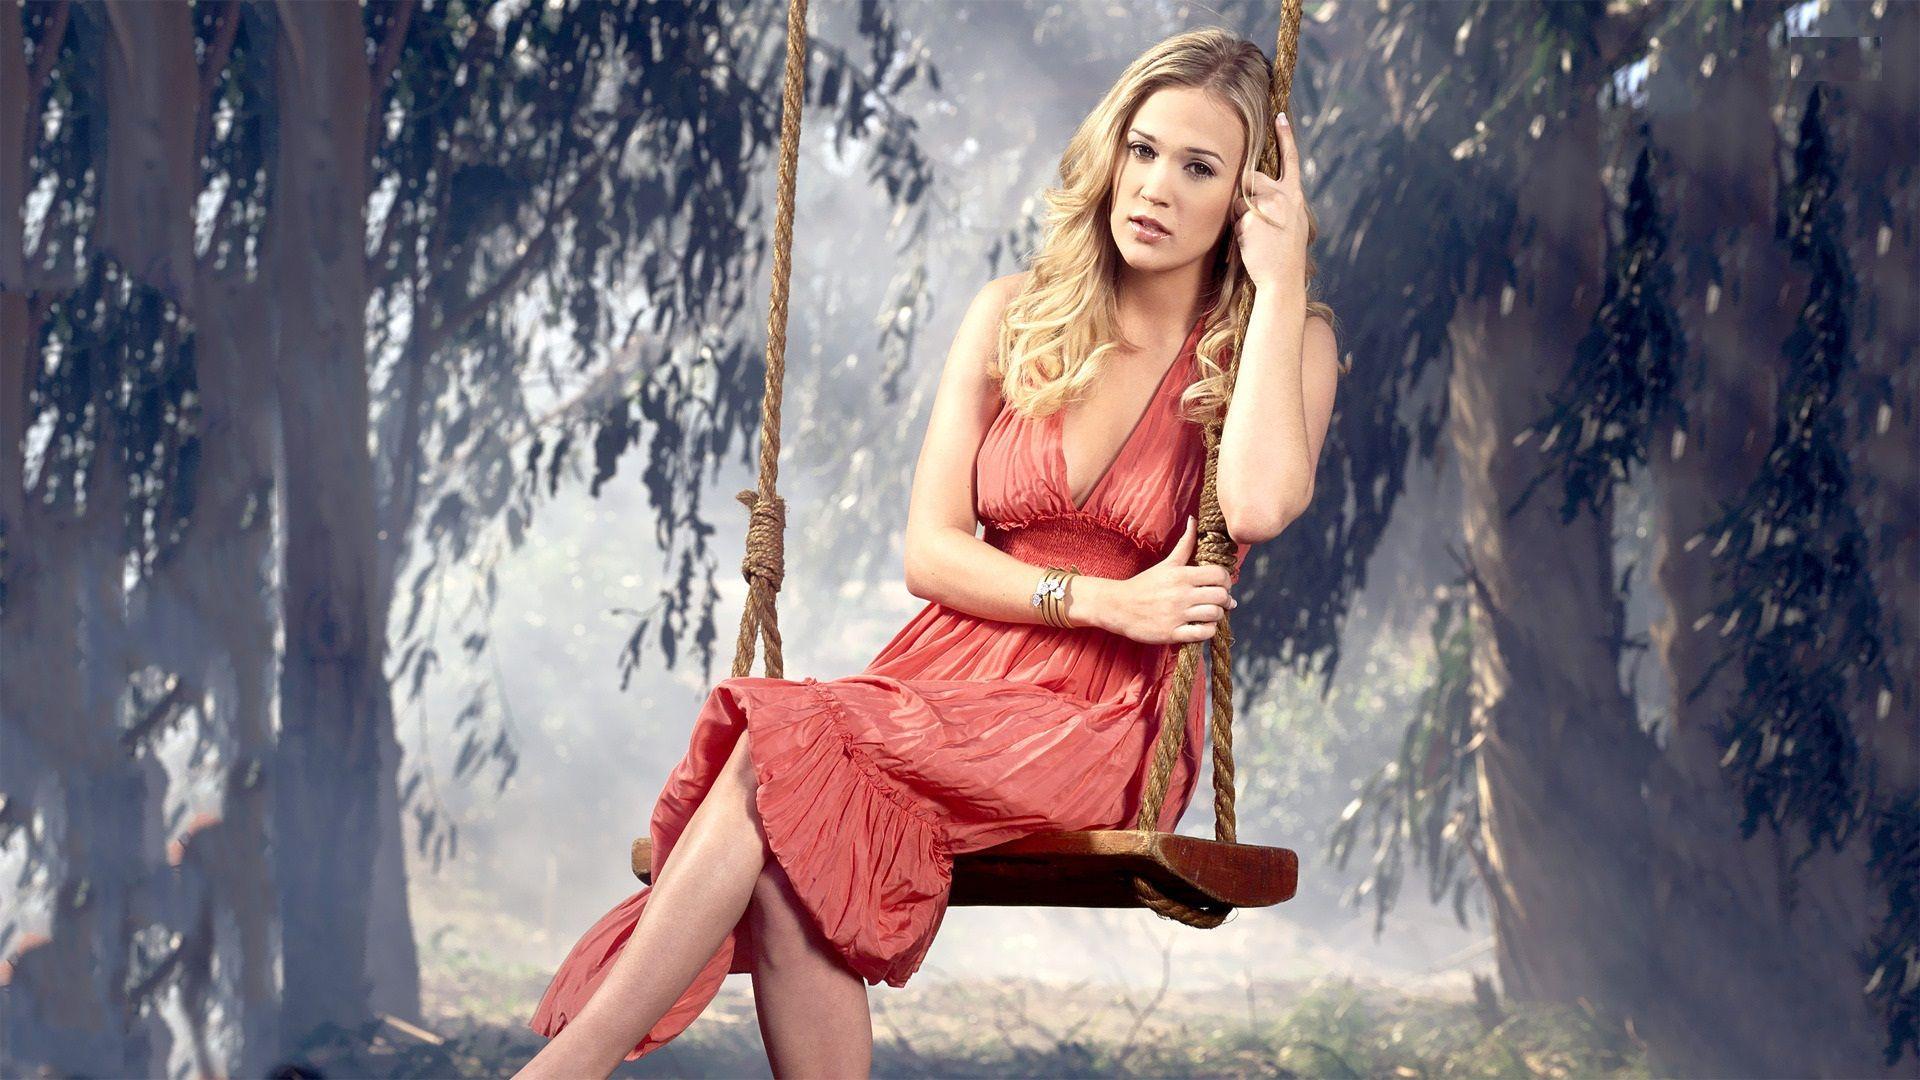 1920x1200 Carrie Underwood Interesting Wallpaper Hd 2015 Wallpaper Carrie Underwood Carrie Underwood Hair